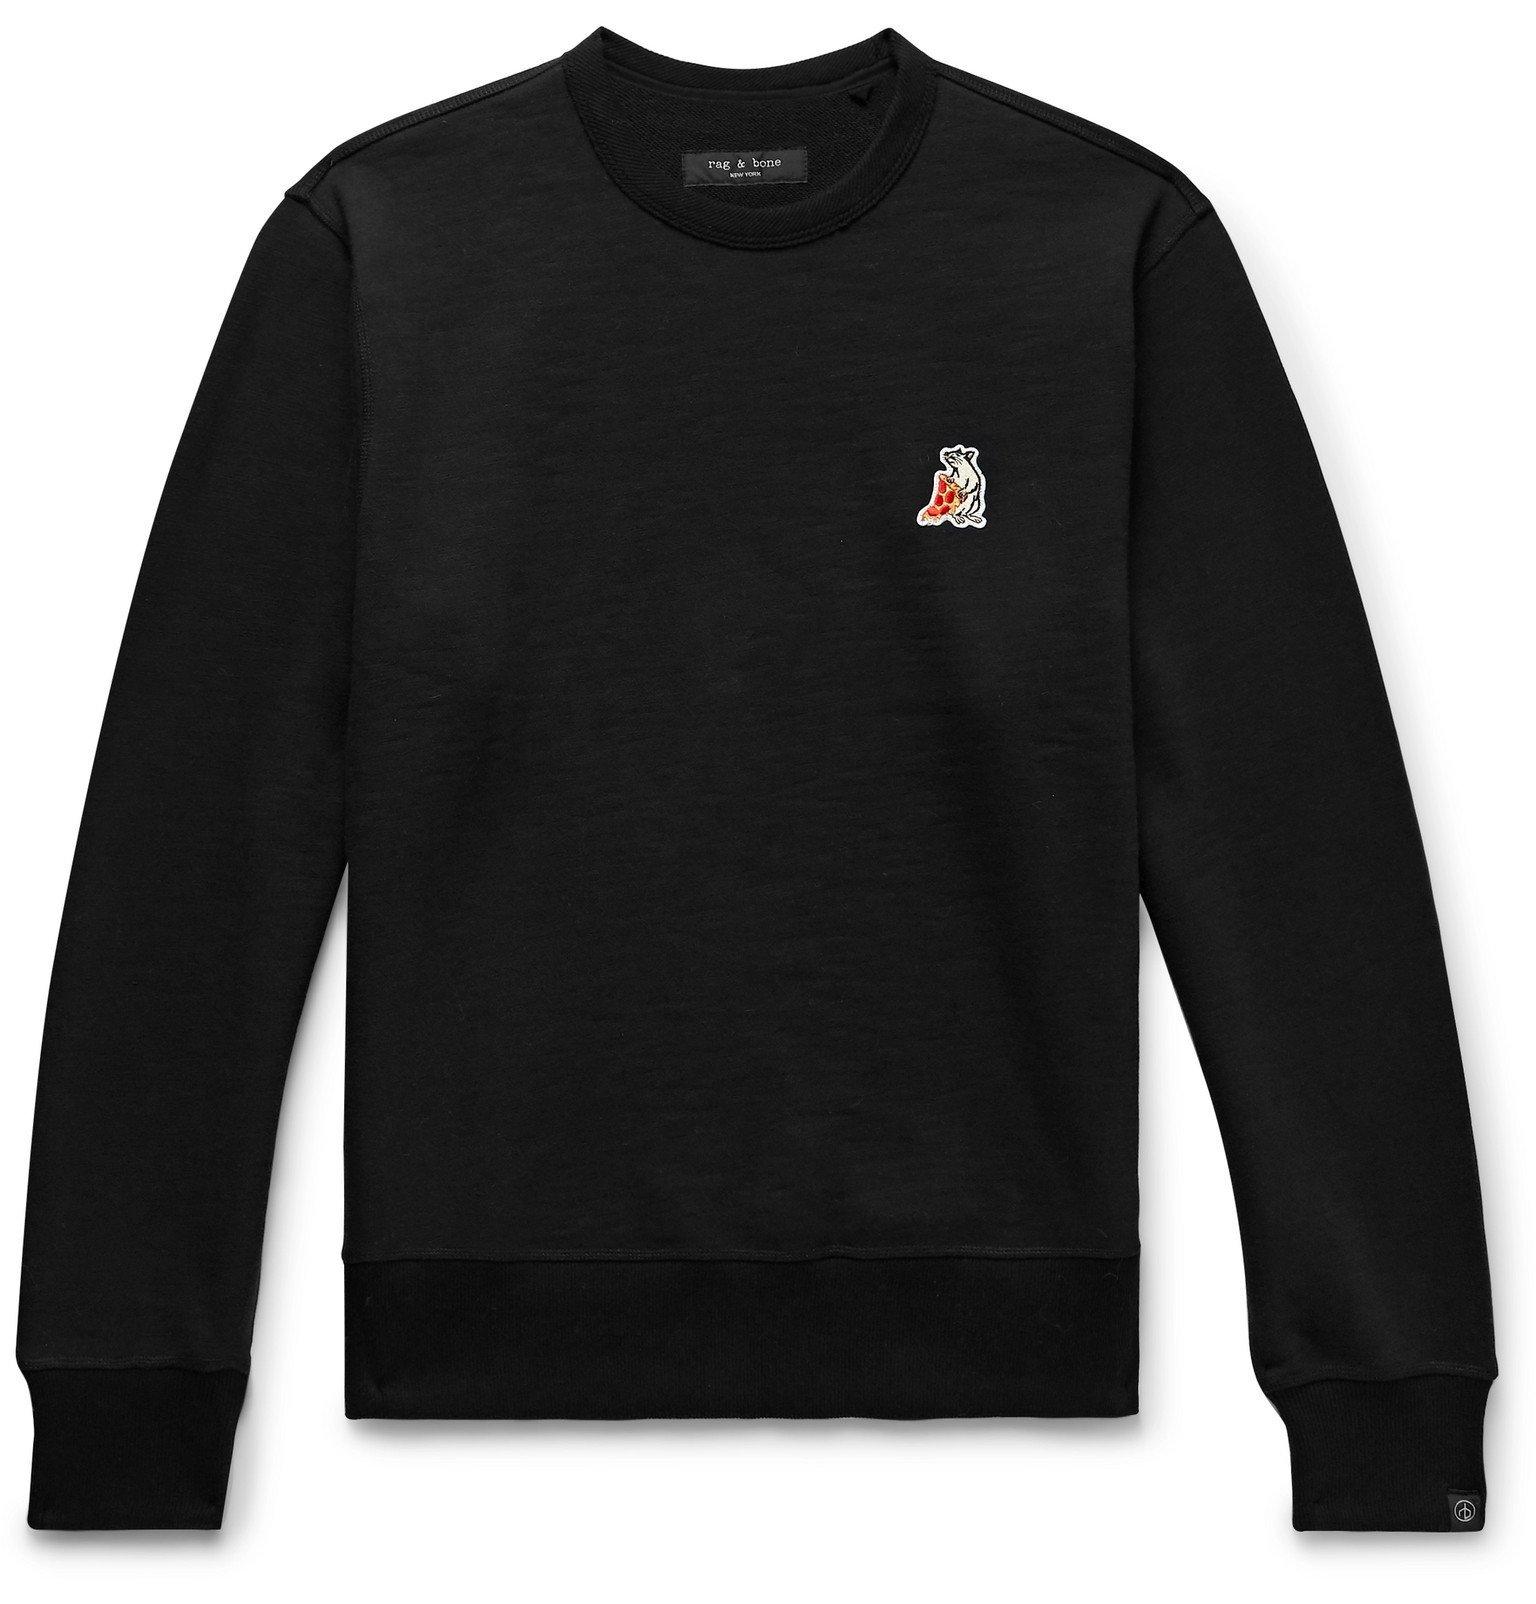 Photo: rag & bone - Appliquéd Loopback Cotton-Jersey Sweatshirt - Black